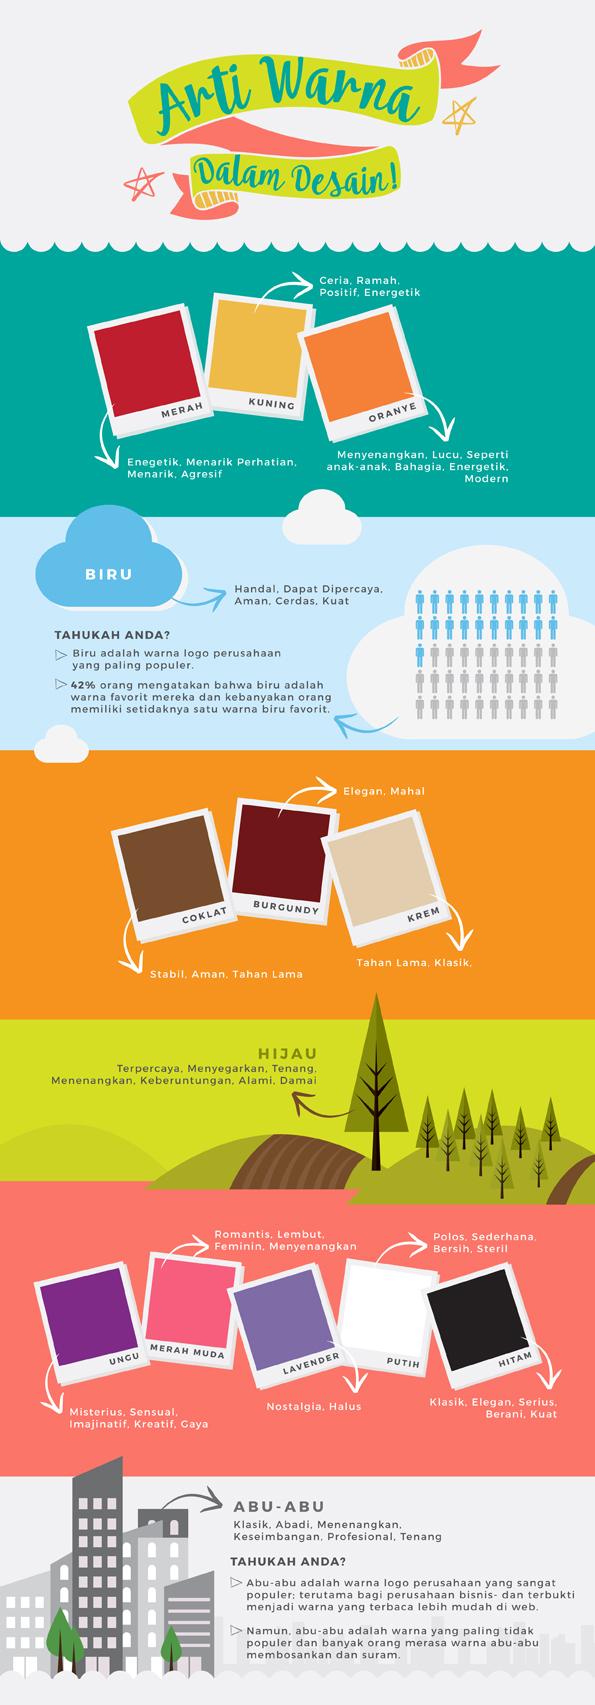 Infografis arti warna